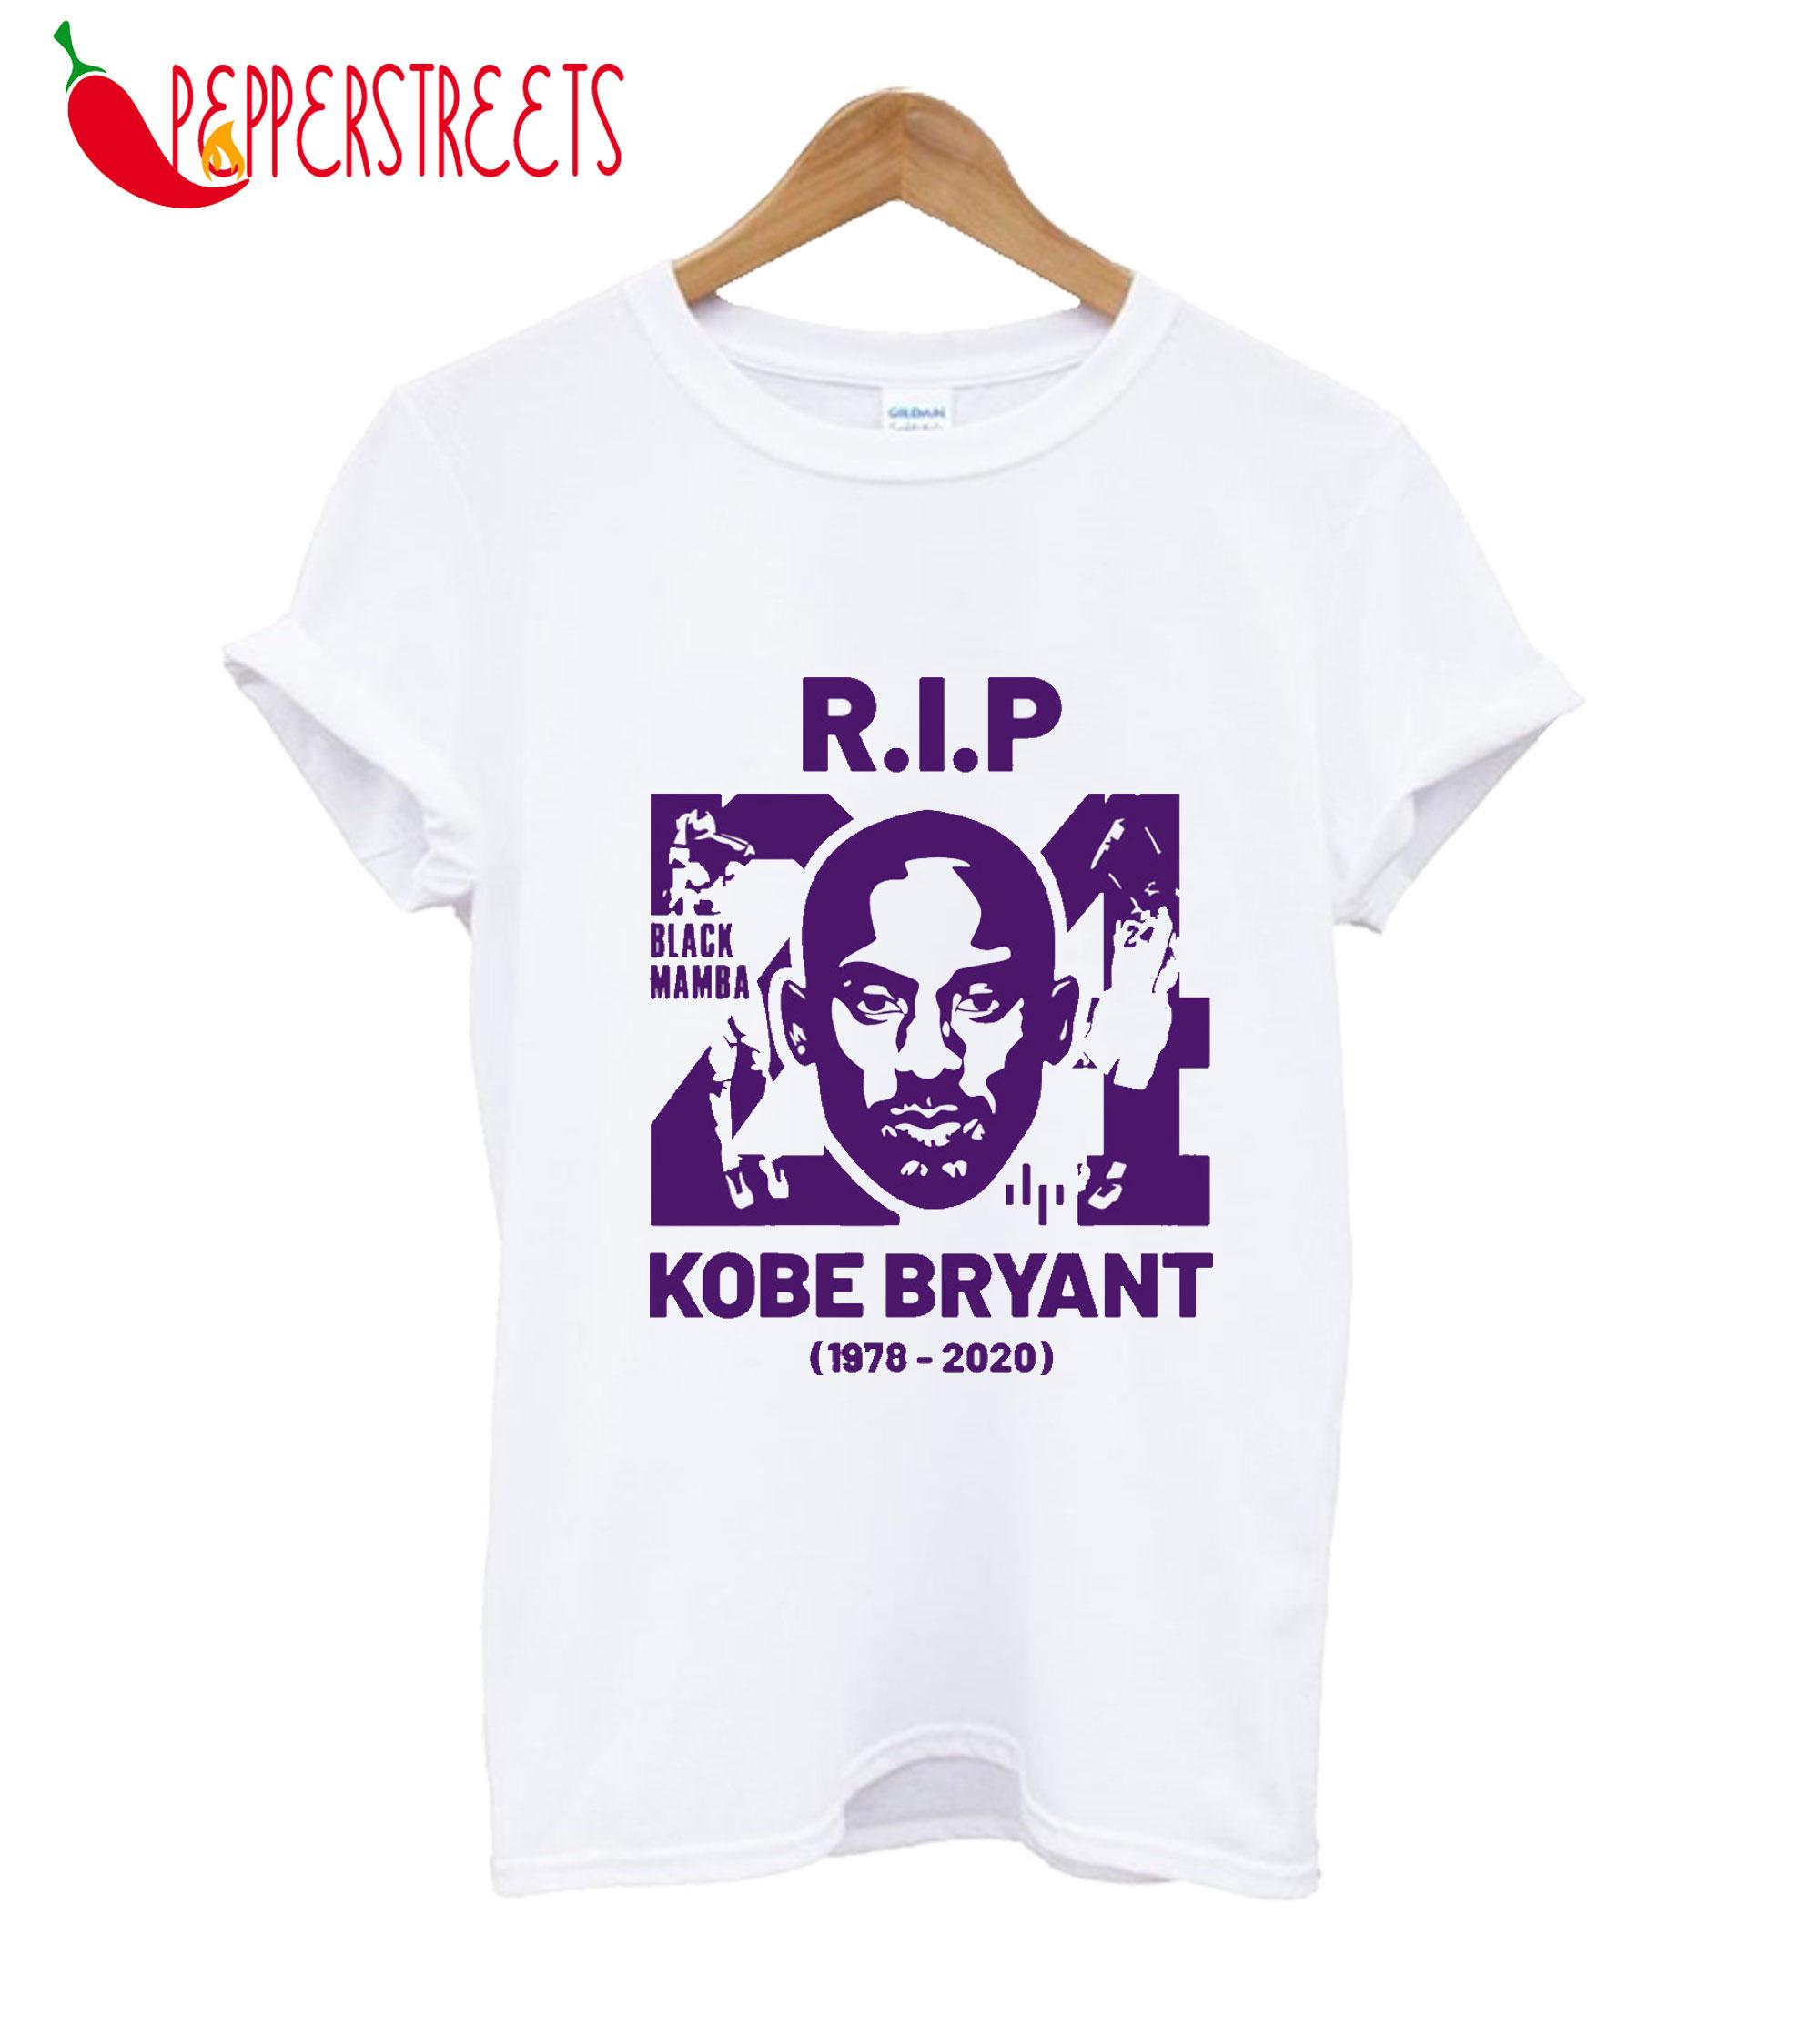 RIP Kobe Bryant (1978-2020) Black Mamba T-Shirt